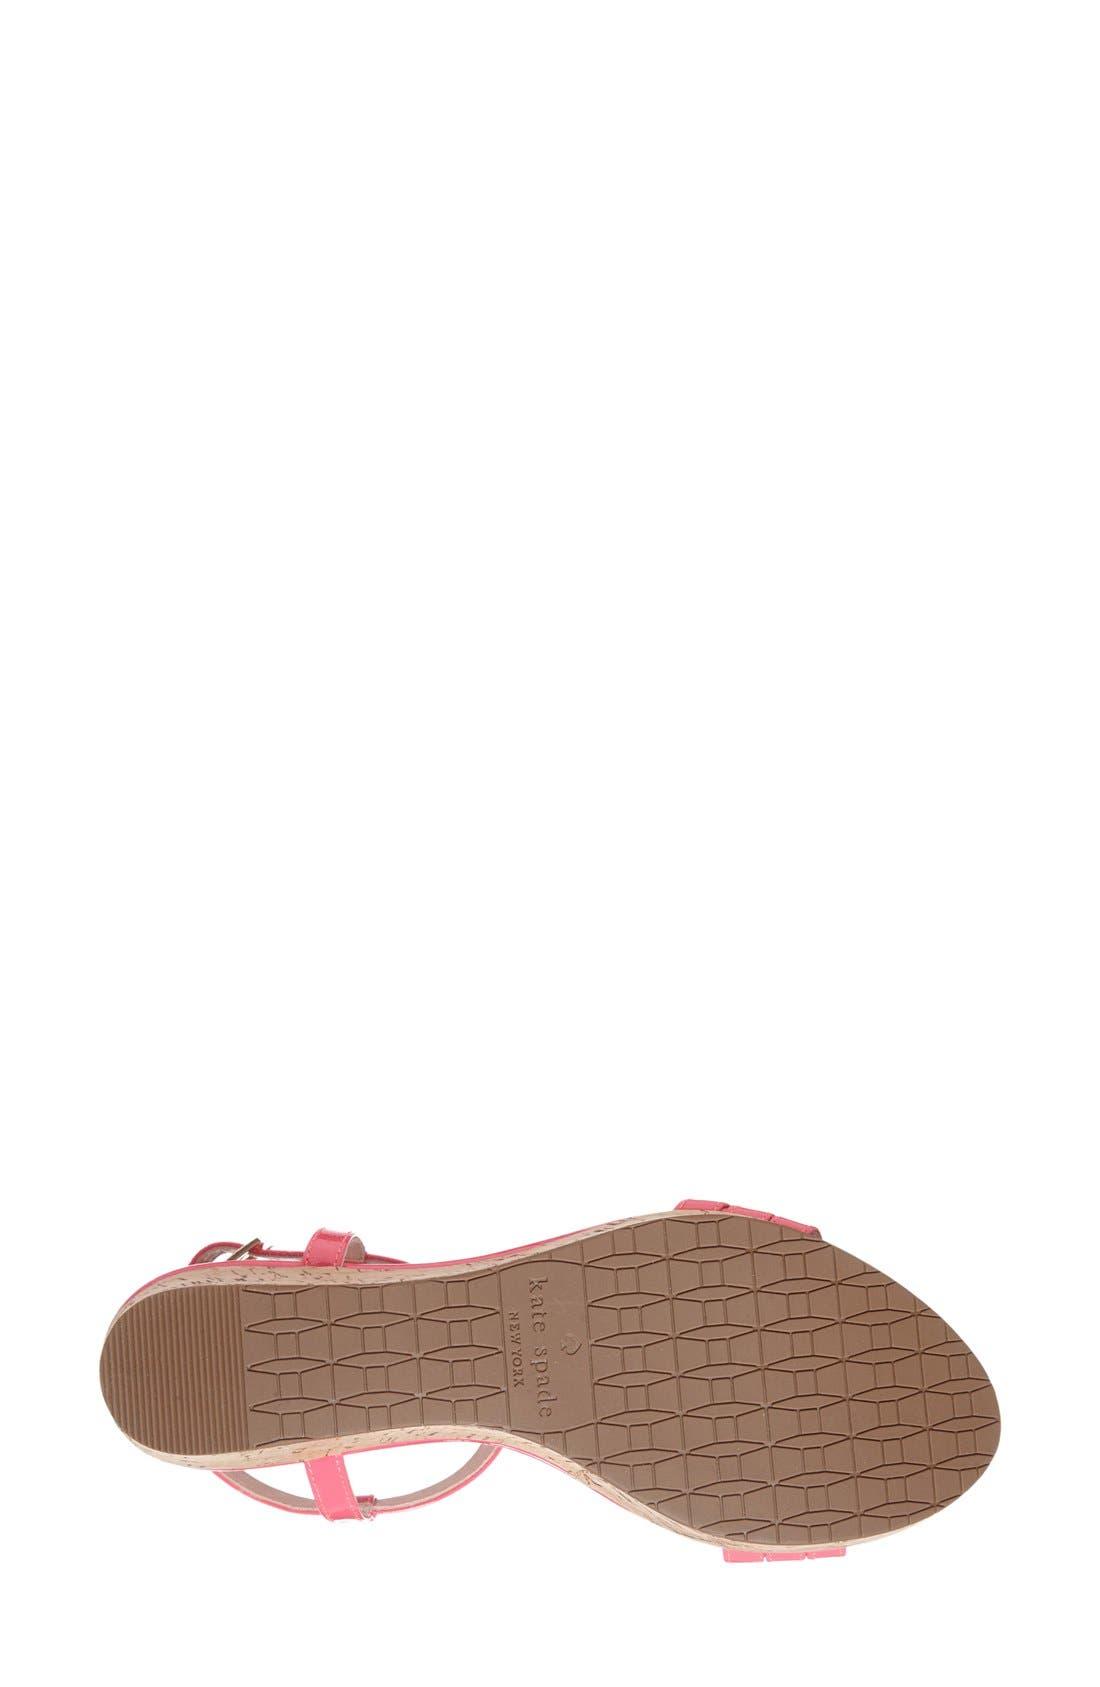 Alternate Image 3  - kate spade new york 'tallin' wedge sandal (Women)